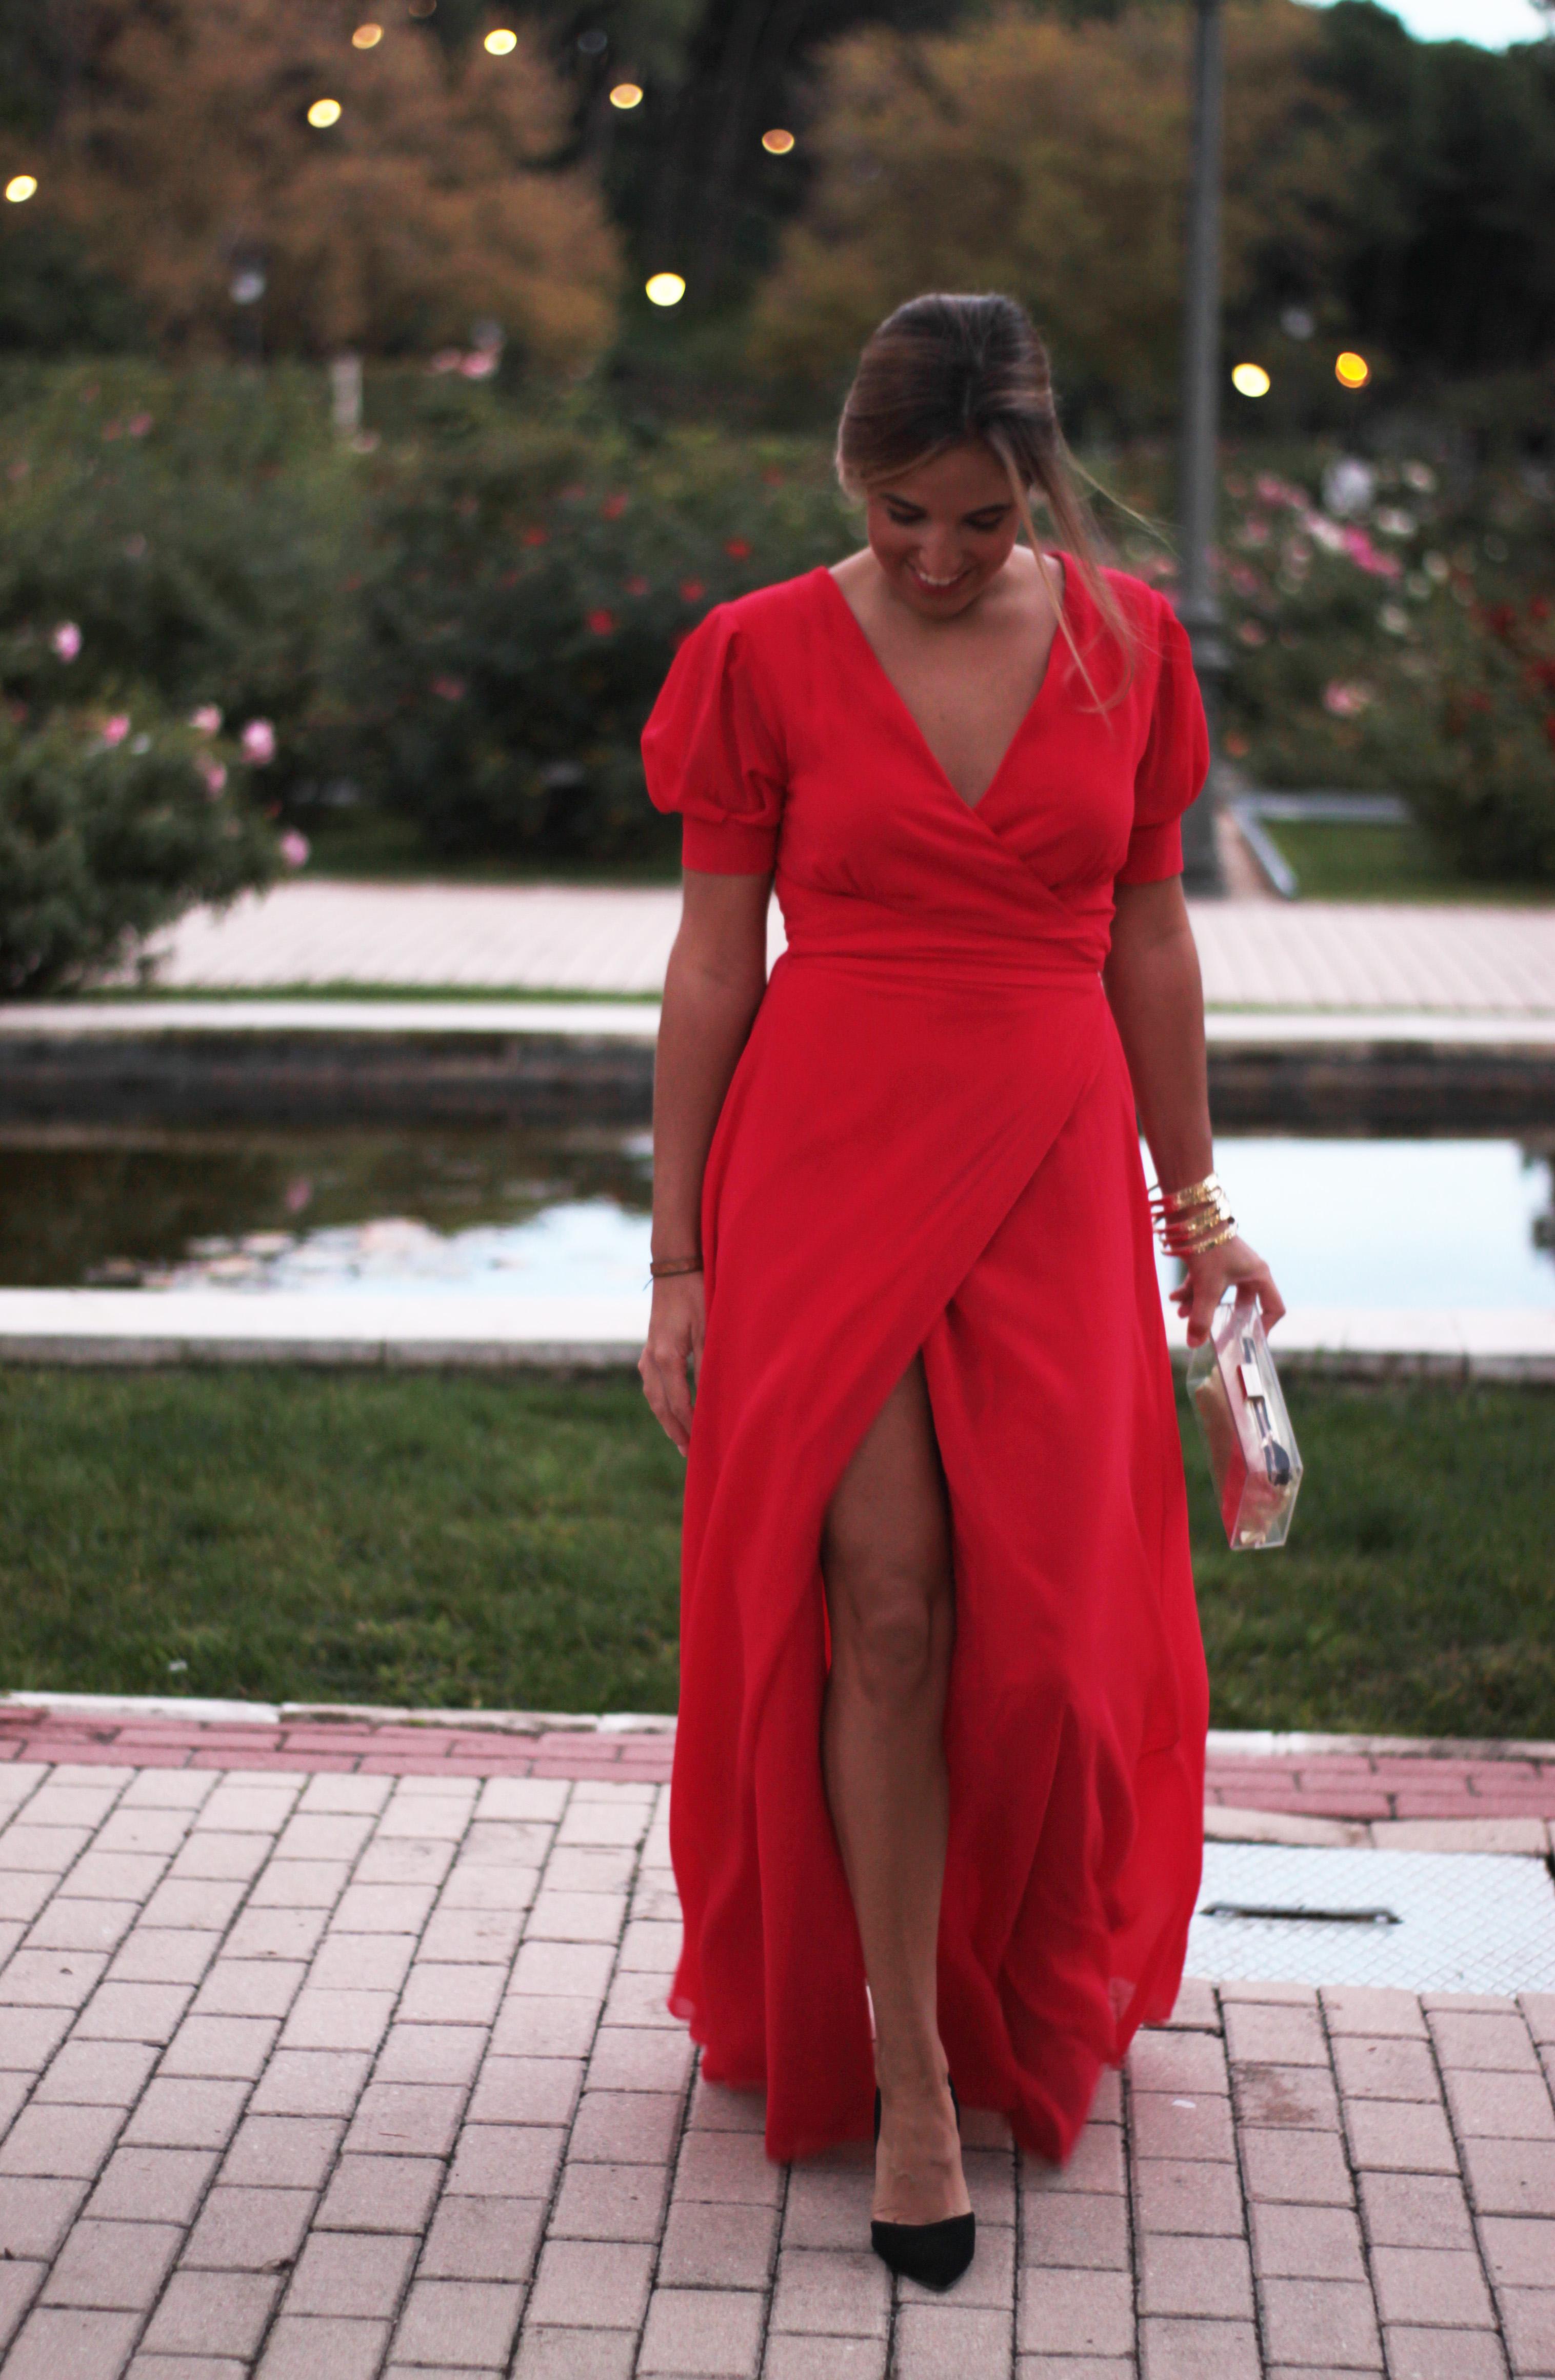 Vestido rojo largo boda noche